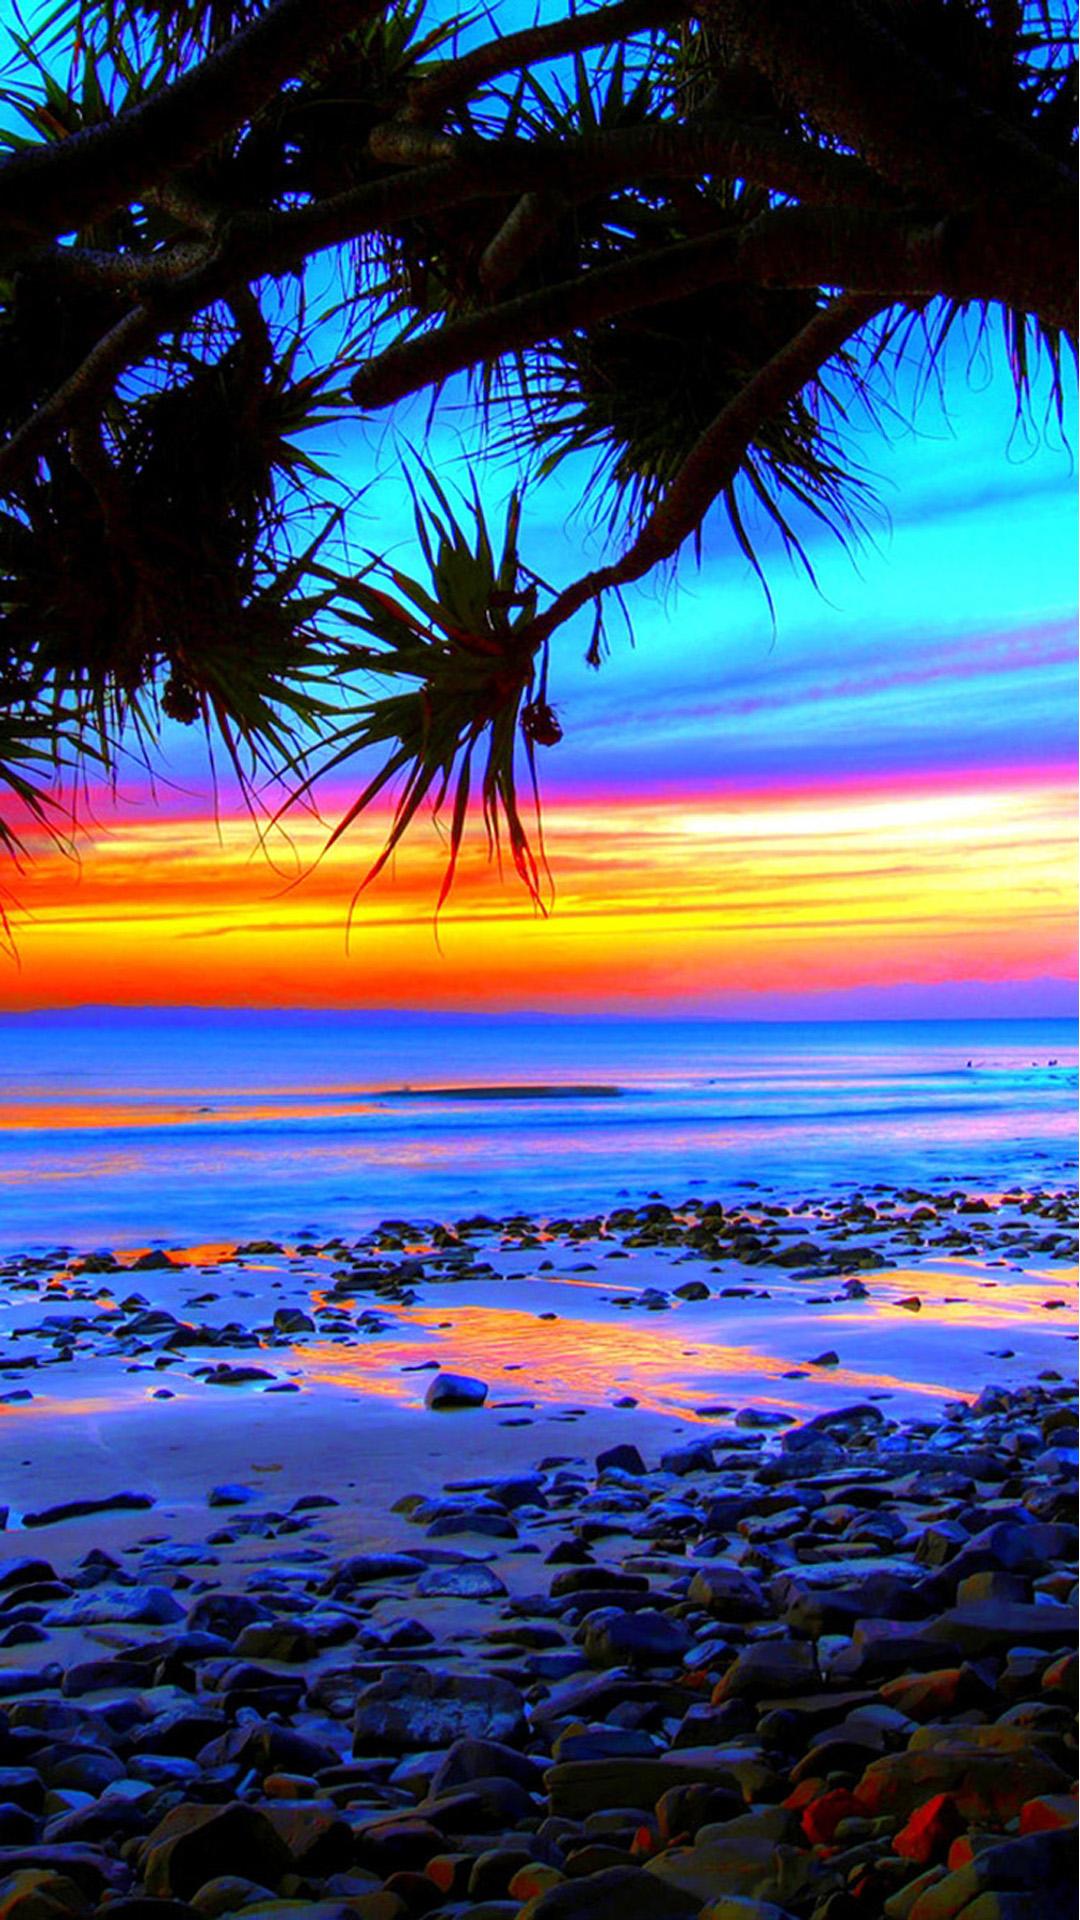 Beach IPhone 6 Plus Wallpaper 81 Wallpapers HD 1080x1920